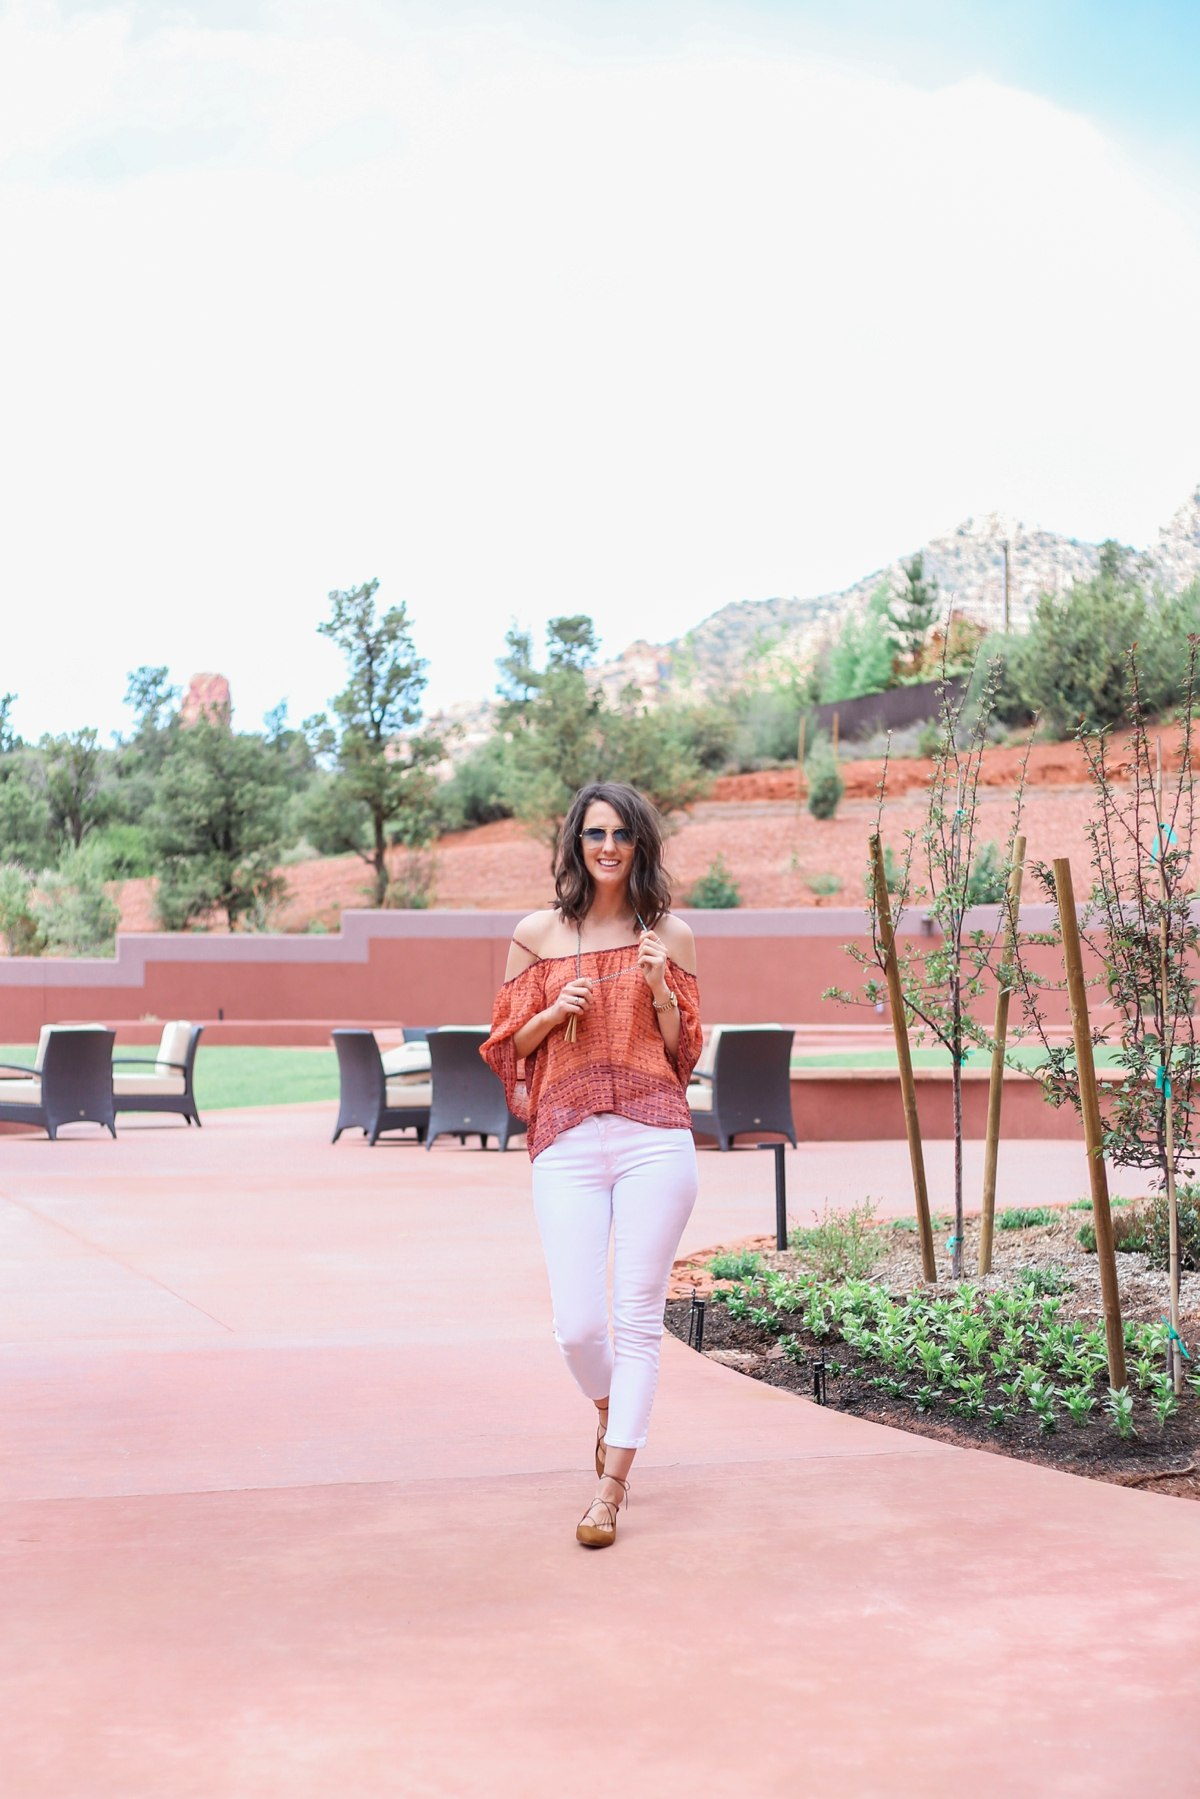 Sedona Tresics + Enjoy Life Diffuser Jewelry with TravelPartTime